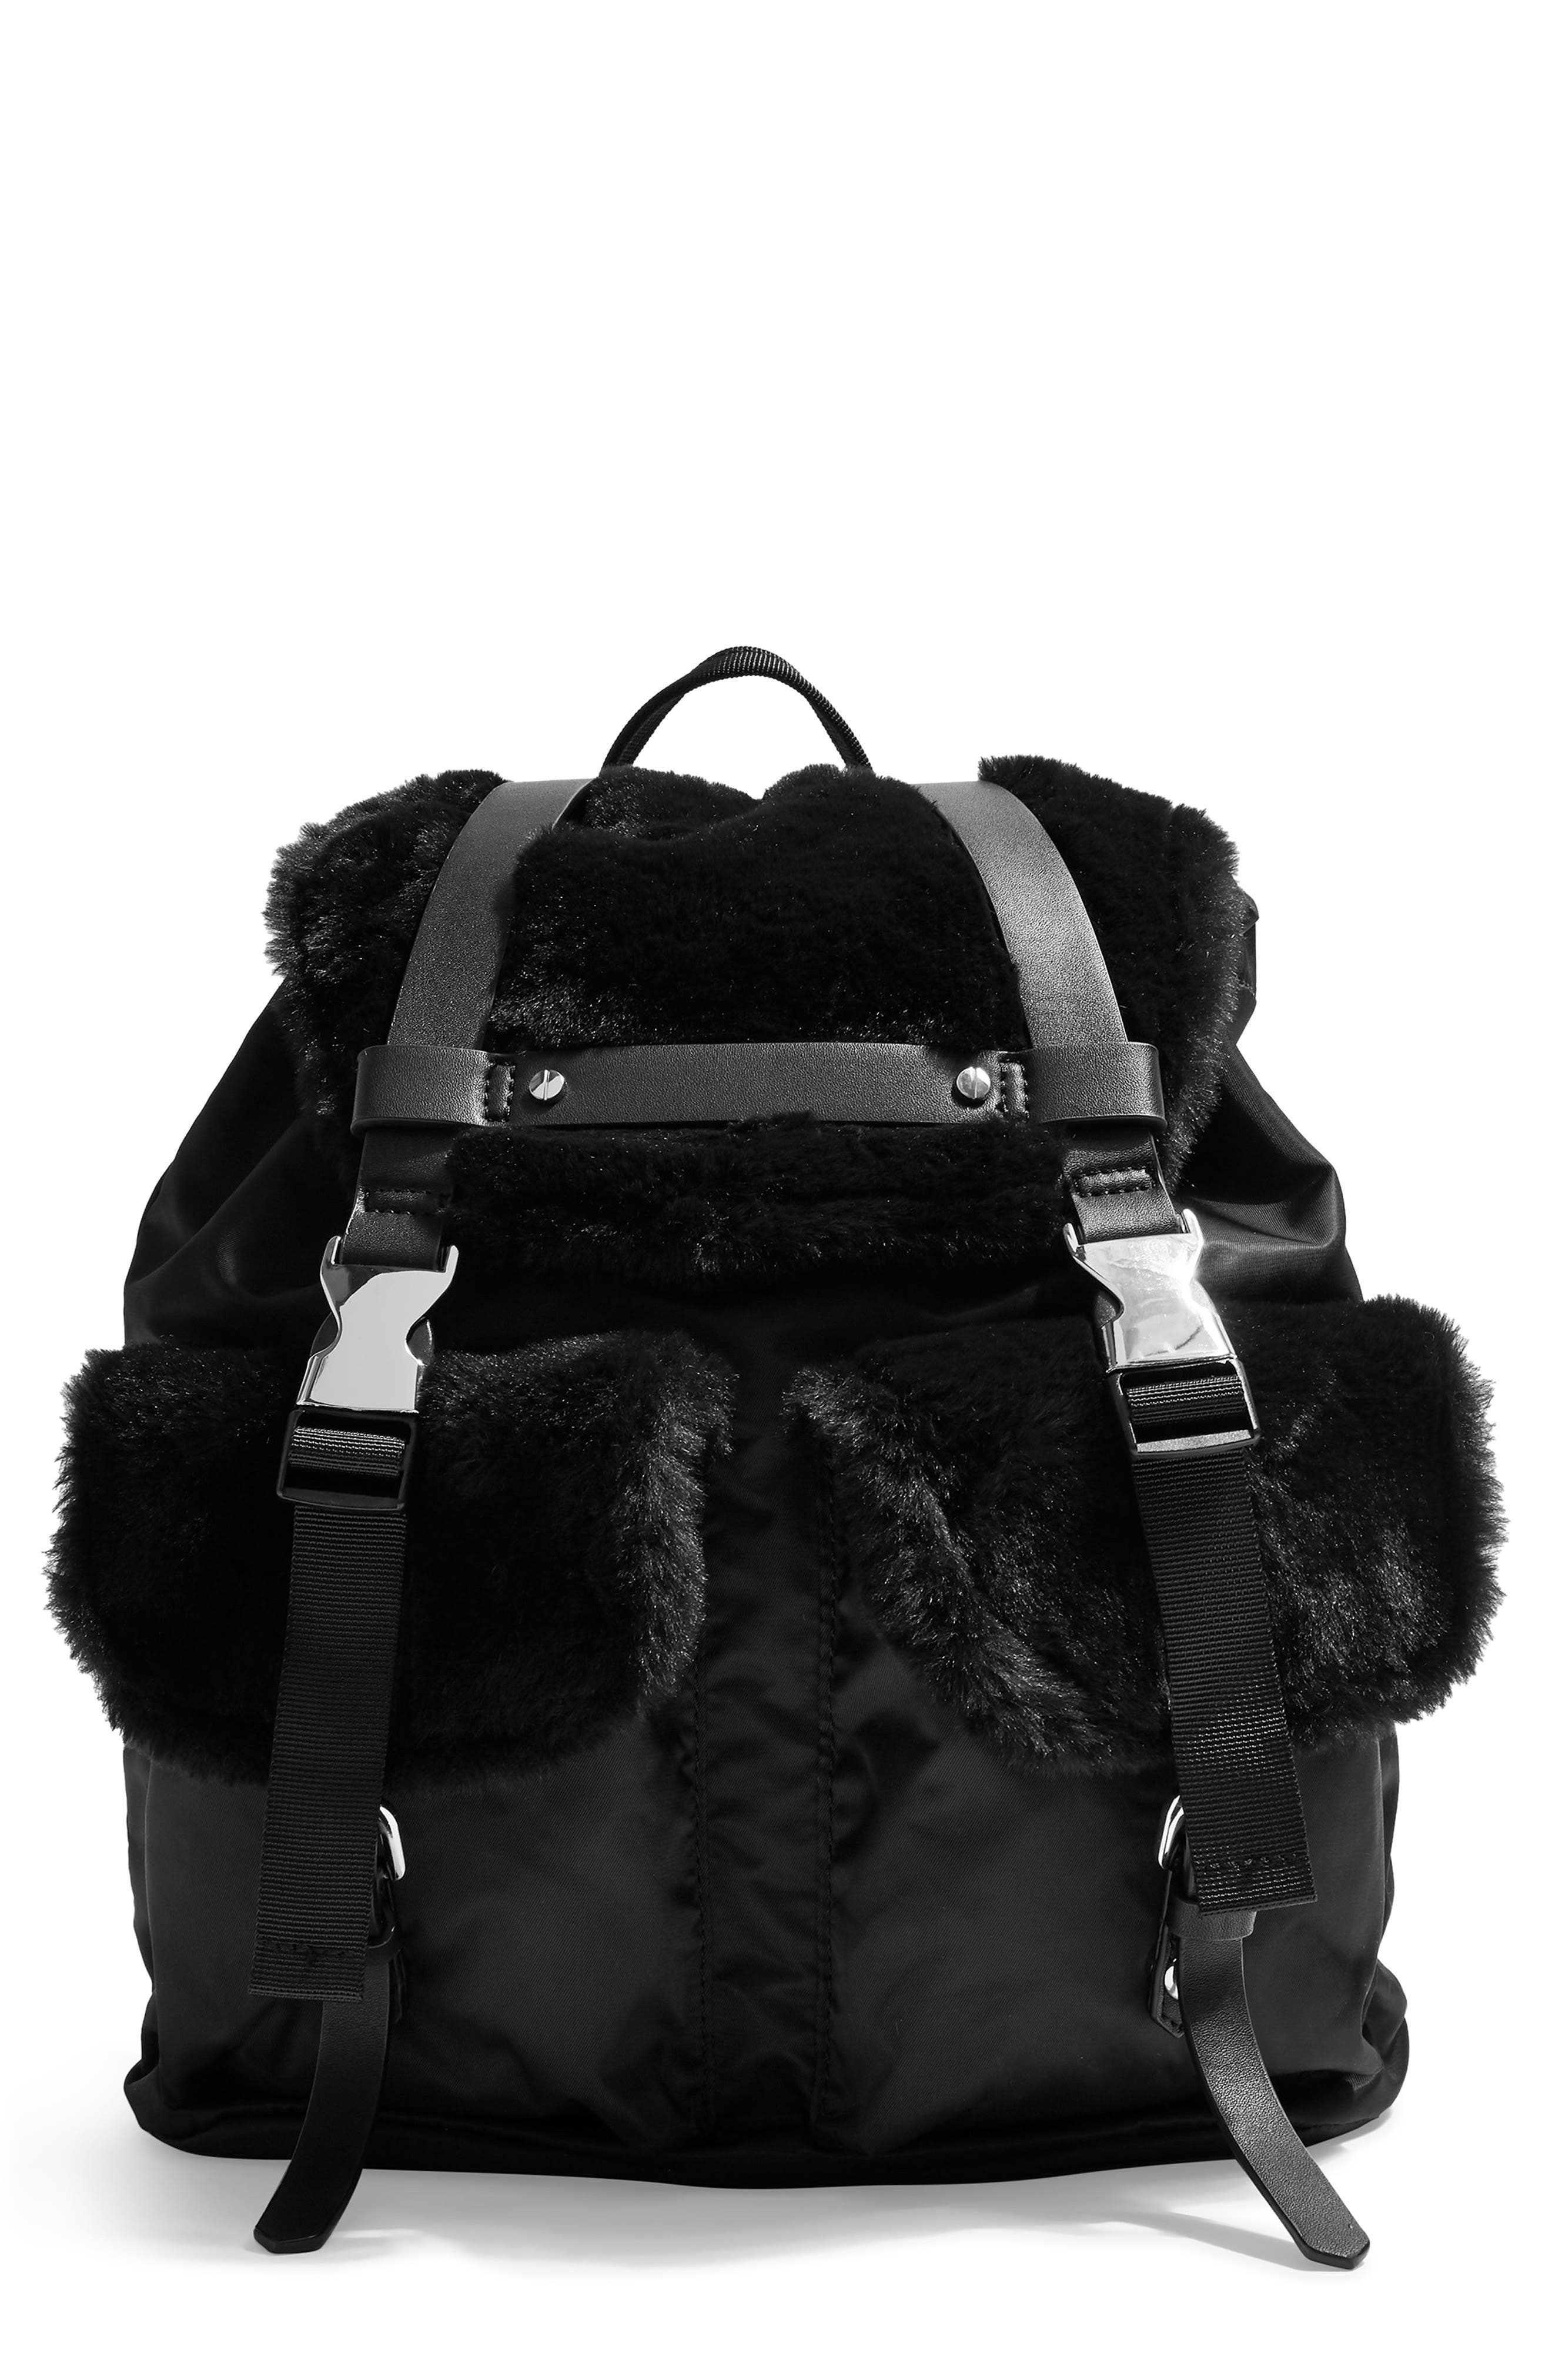 Boston Faux Fur Backpack,                             Main thumbnail 1, color,                             BLACK